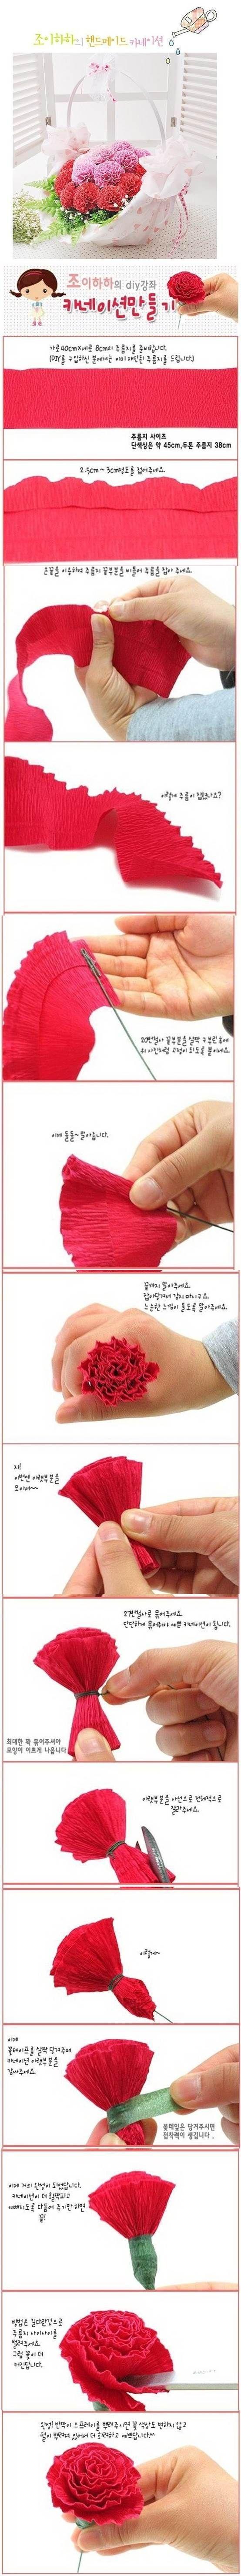 DIY Beautiful Crepe Paper Carnation | iCreativeIdeas.com LIKE Us on Facebook == https://www.facebook.com/icreativeideas